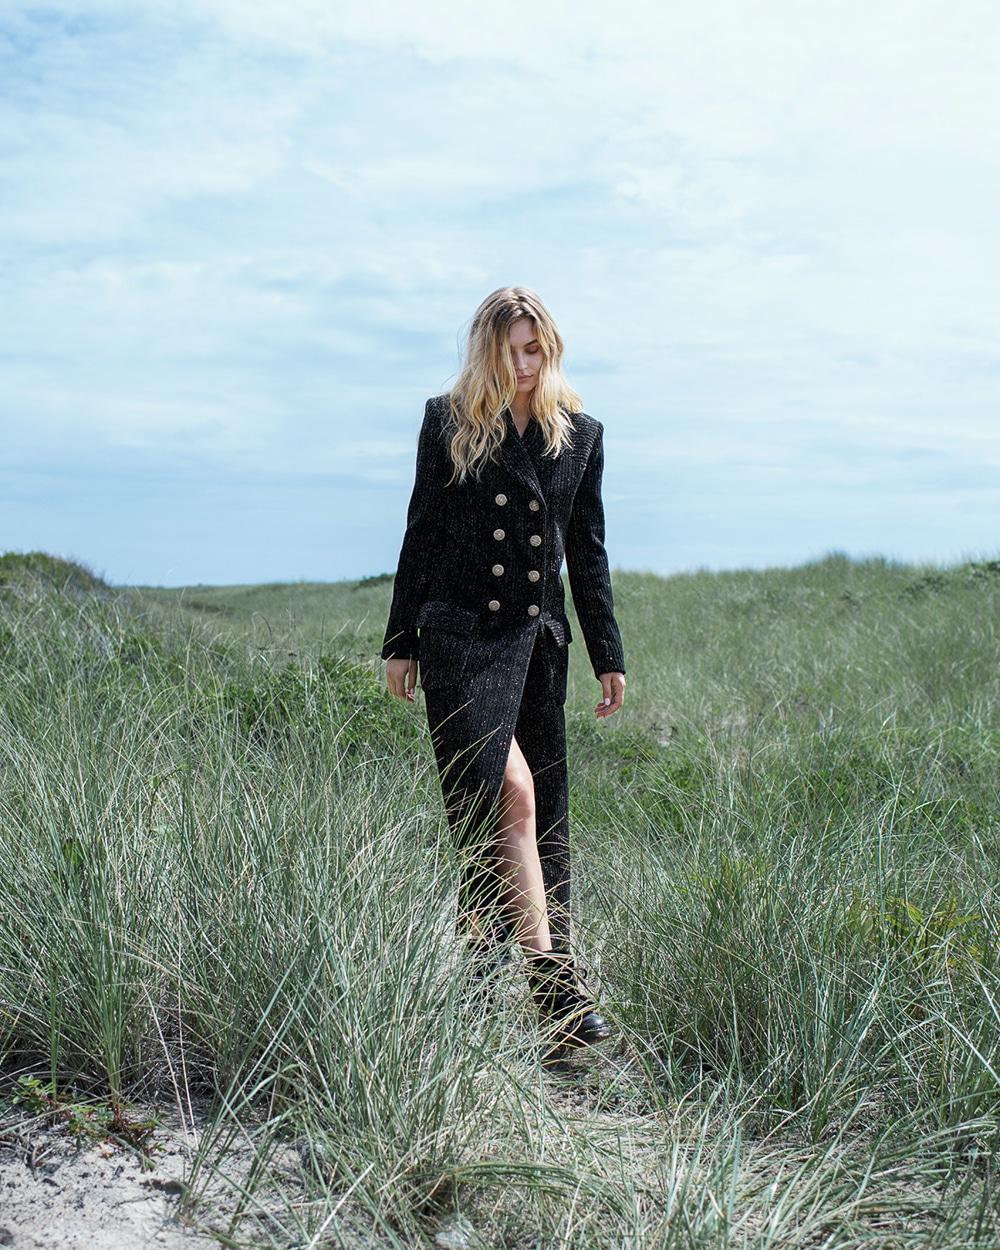 Roosmarijn-De-Kok-The-Gloss-Magazine-Anne-Menke-6.jpg